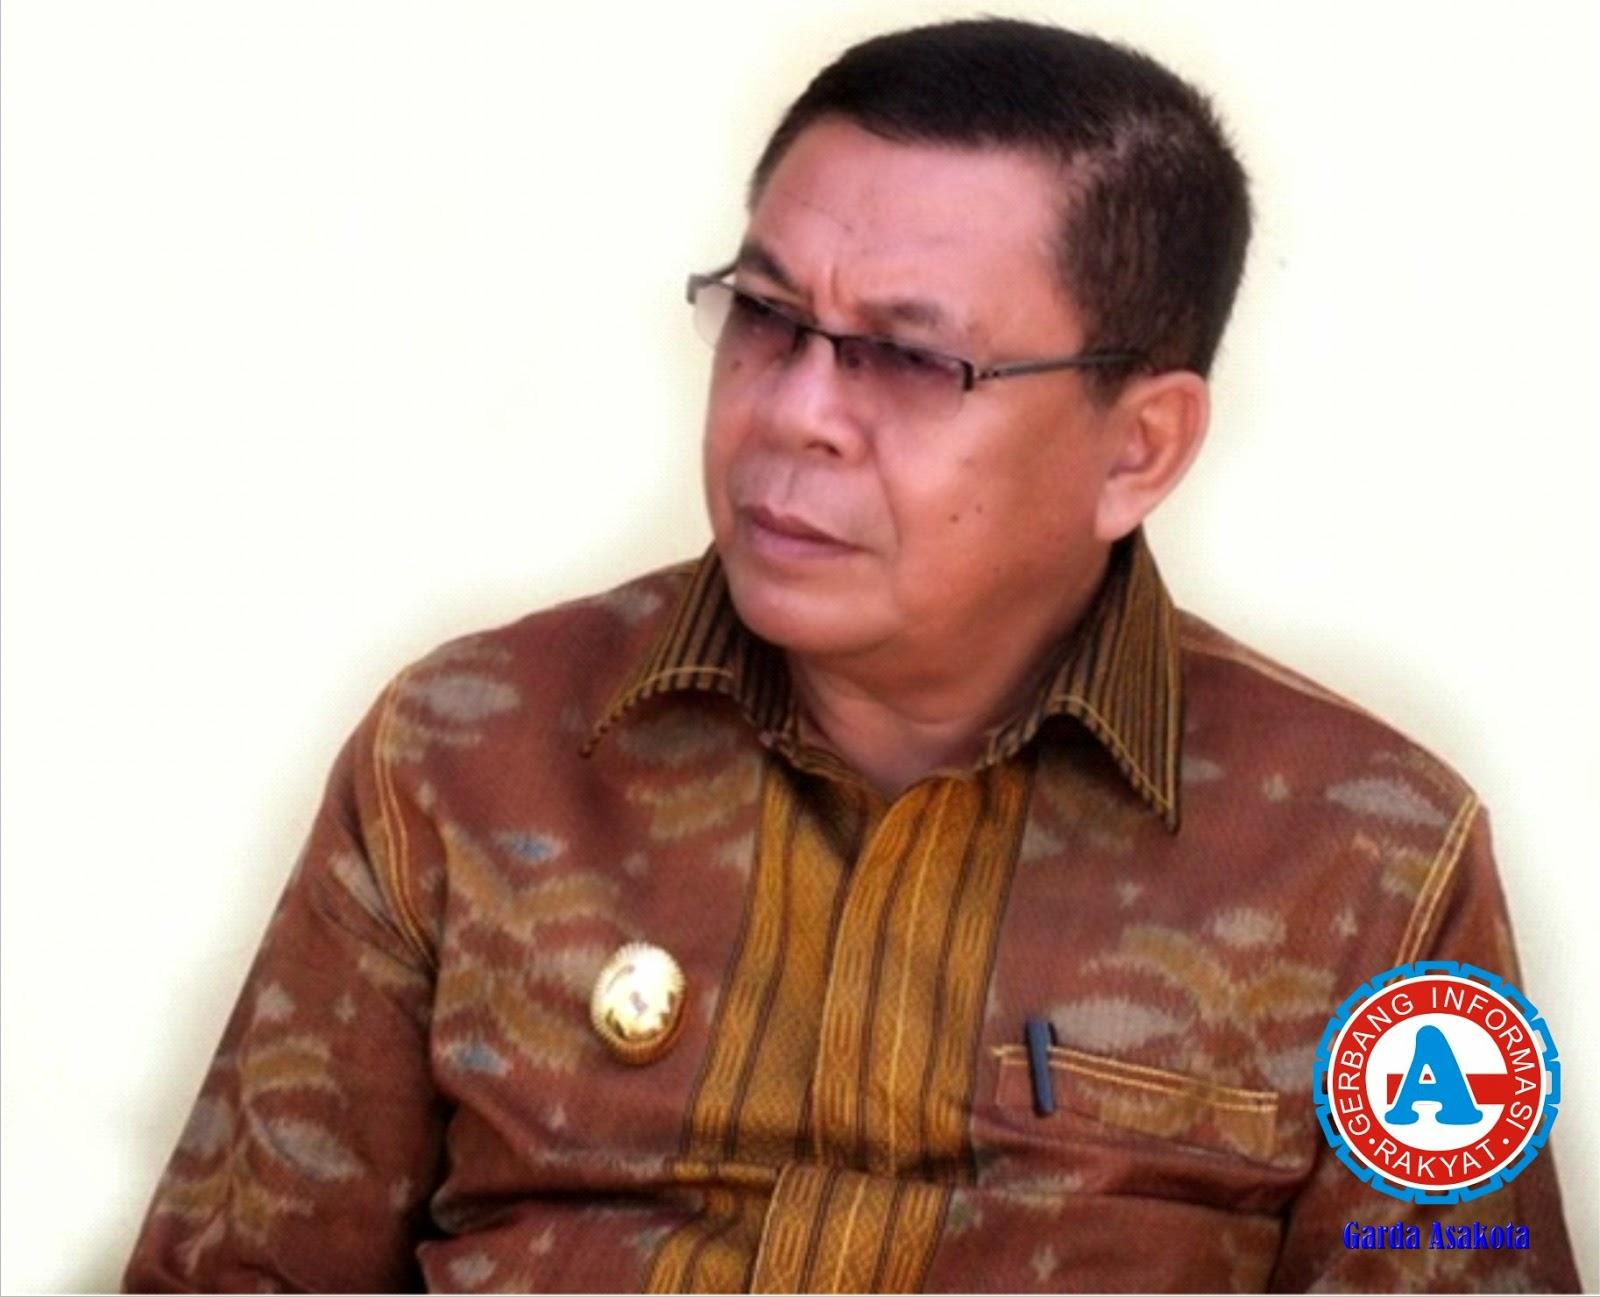 Nasdem Dukung H. Syafru Calon Bupati Bima 2015-2020